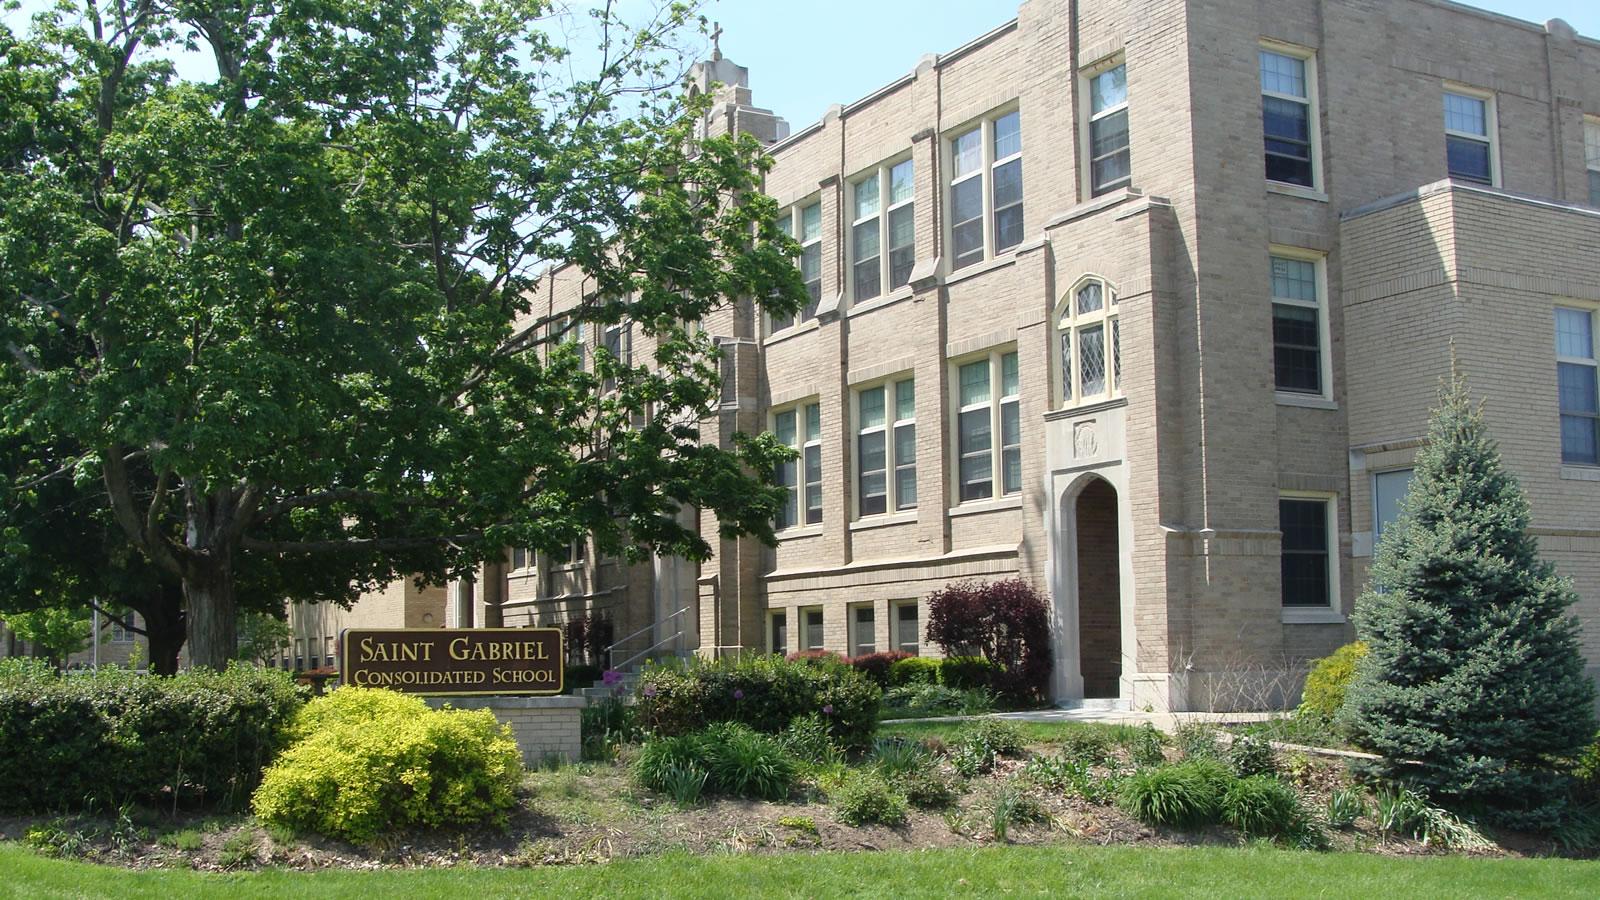 St. Gabriel Consolidated School